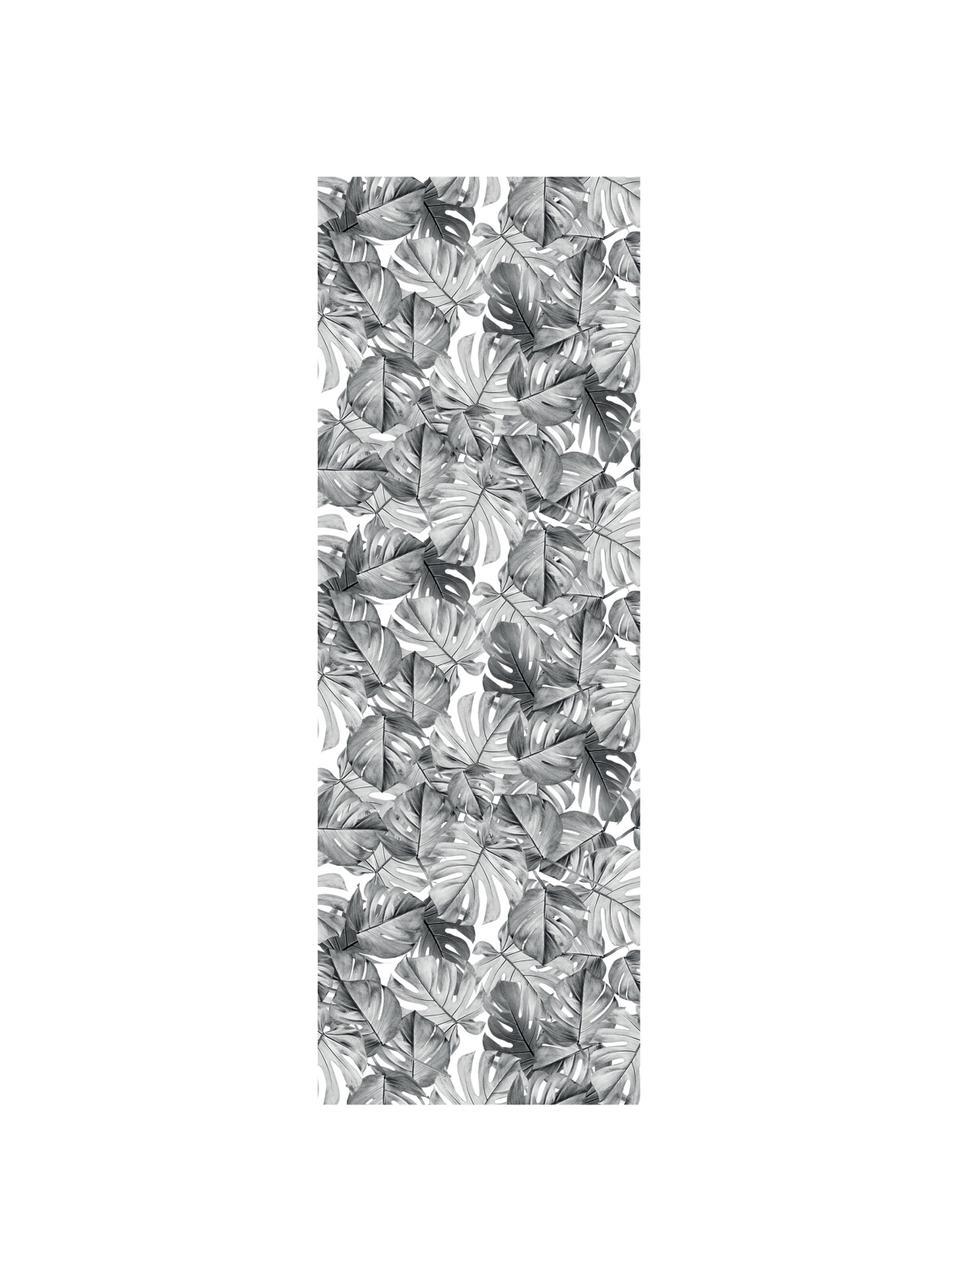 Carta da parati Monstera, Tessuto non tessuto, ecologico e biodegradabile, Nero, bianco, Larg. 97 x Alt. 280 cm